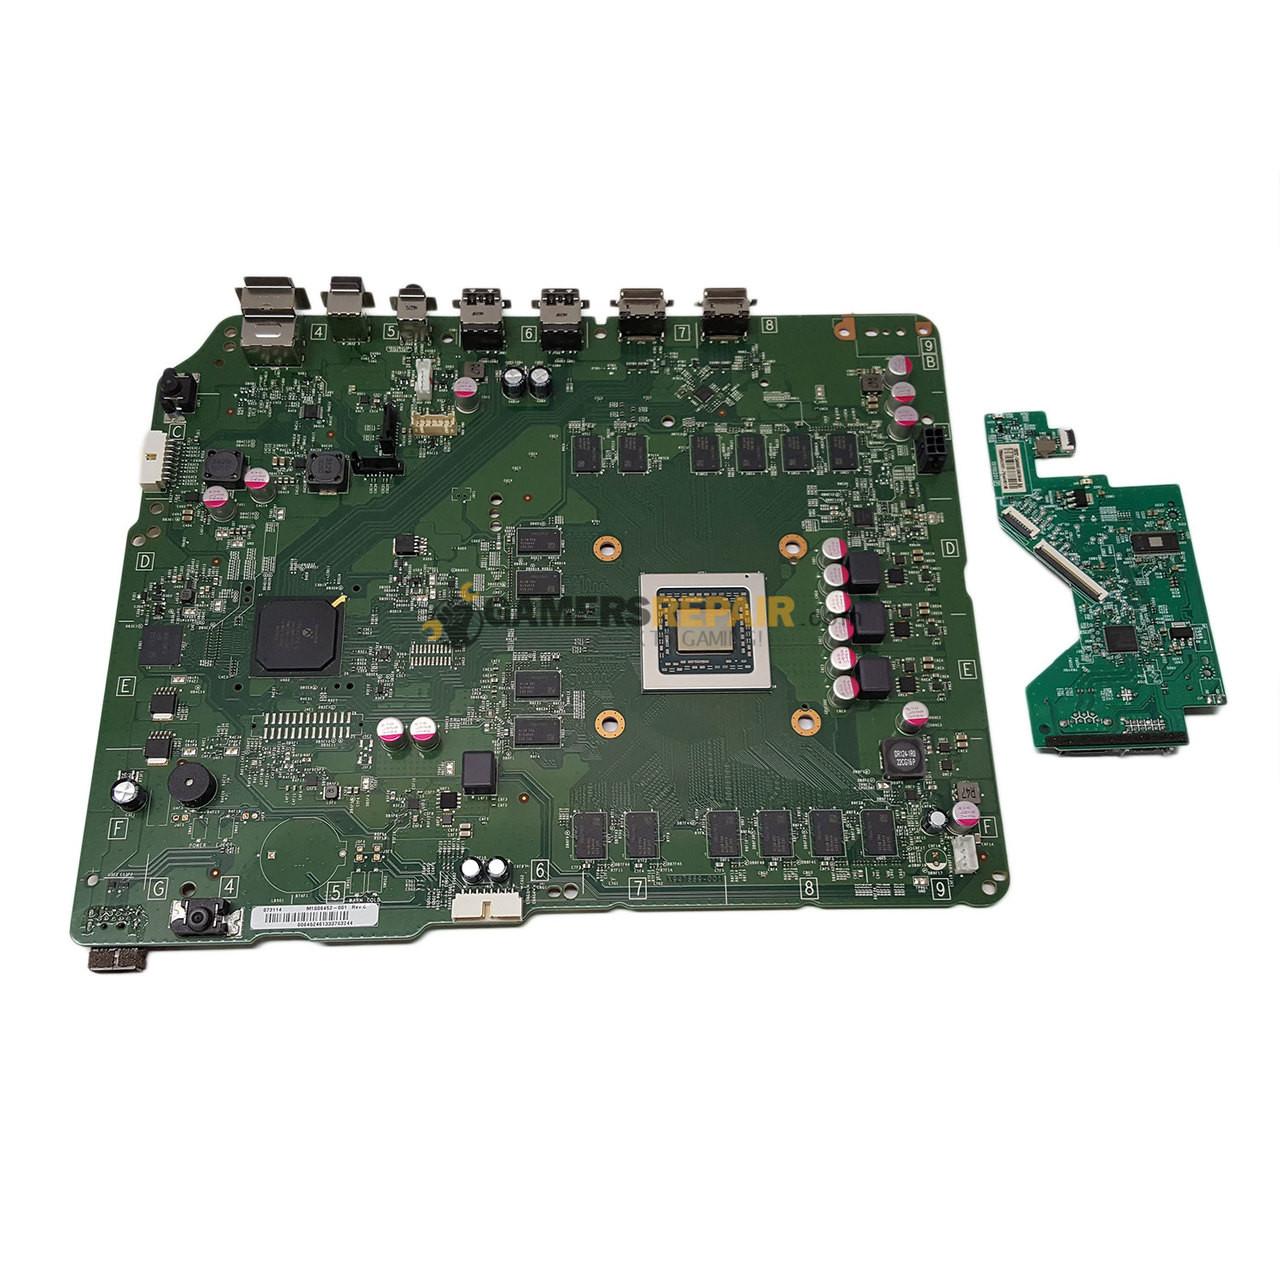 Xbox One Motherboard Schematics Schematic Diagrams 360 Diagram On Games Controller S Online U2022